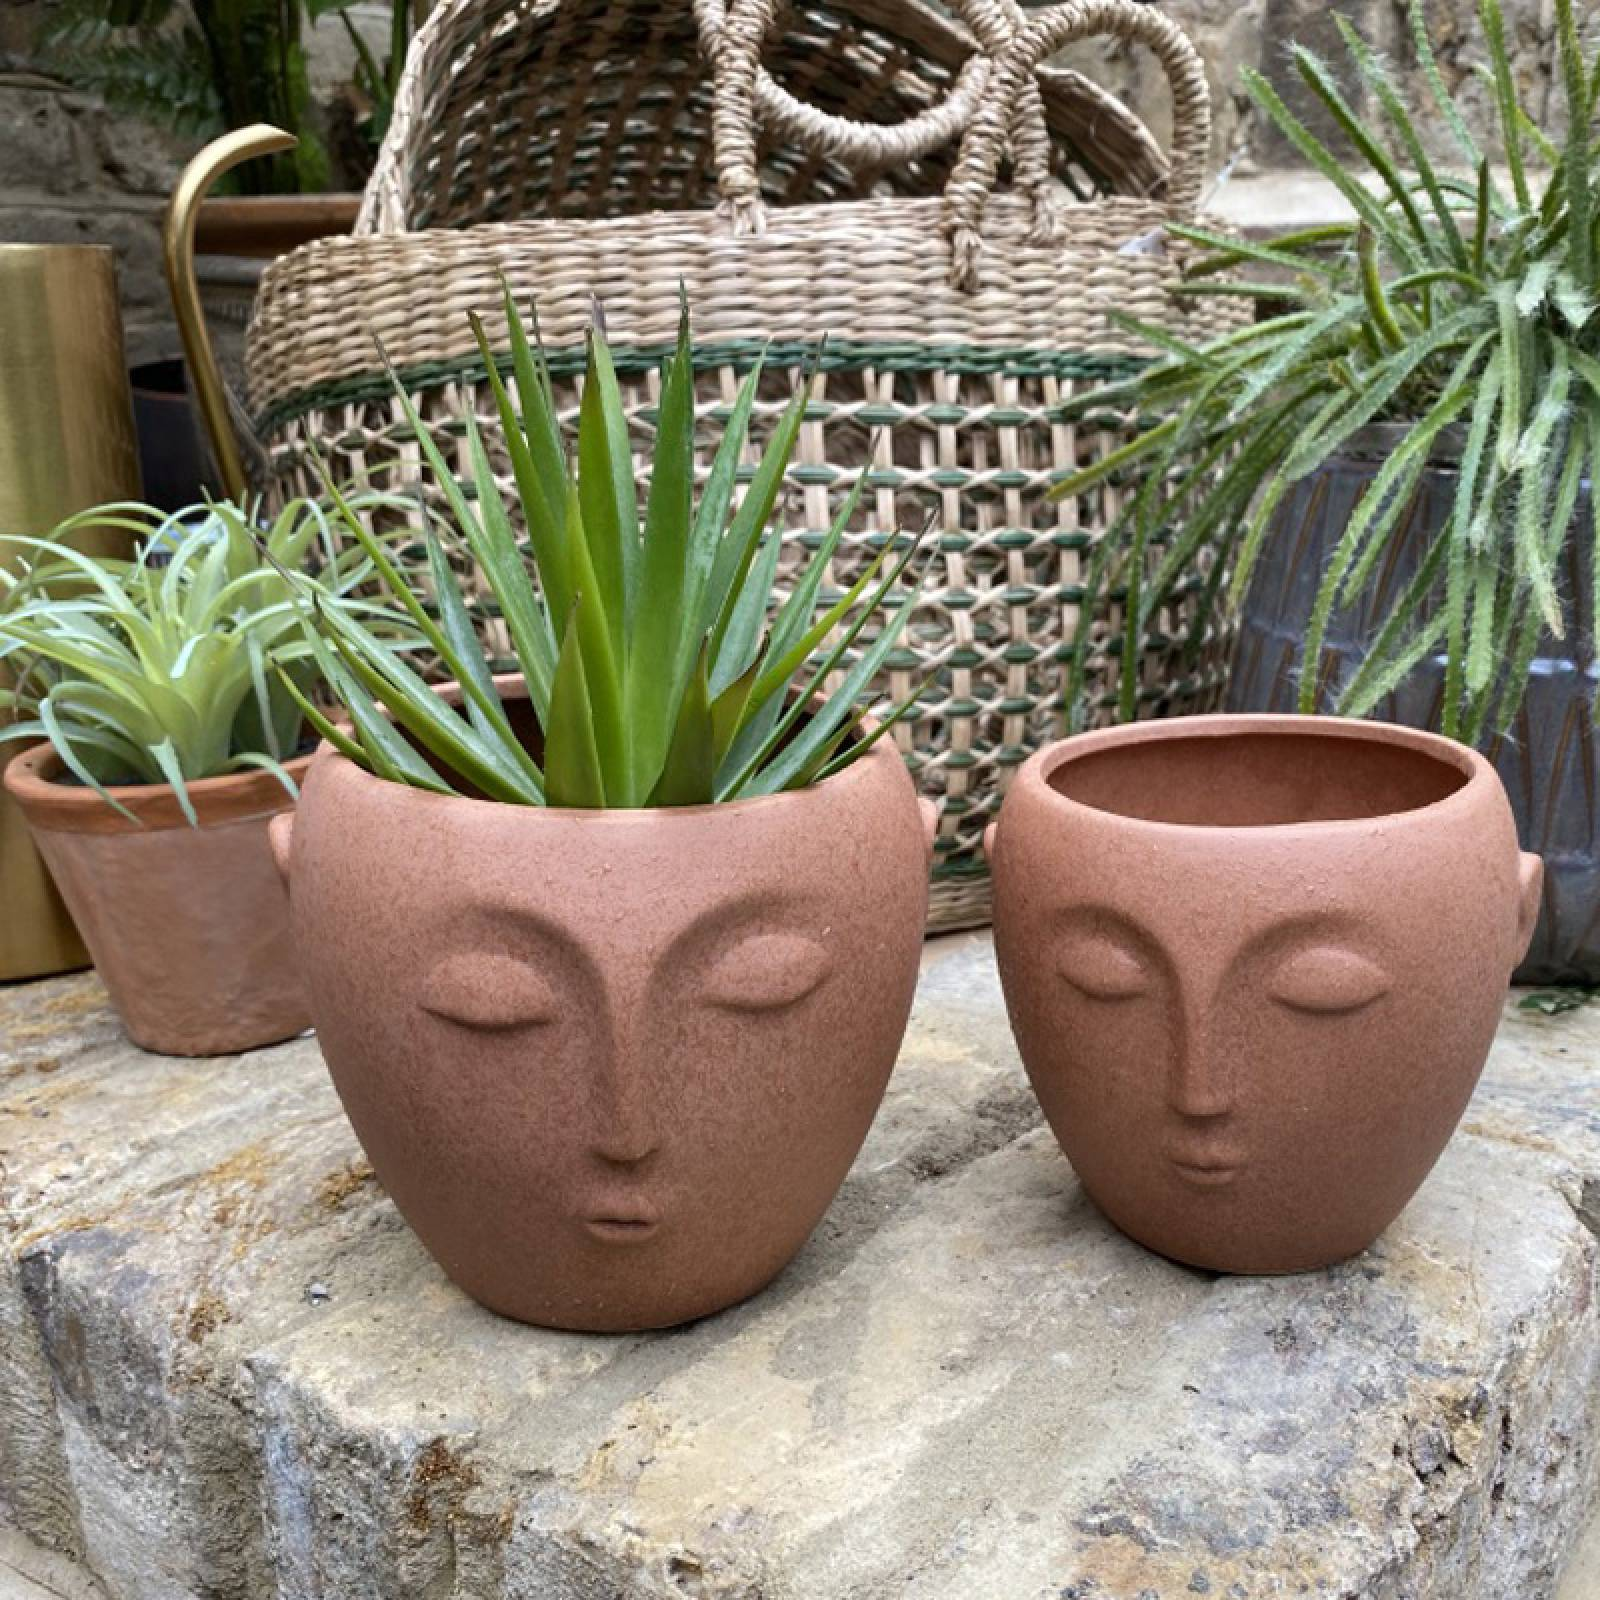 Large Terracotta Flower Pot With Face Imprint thumbnails